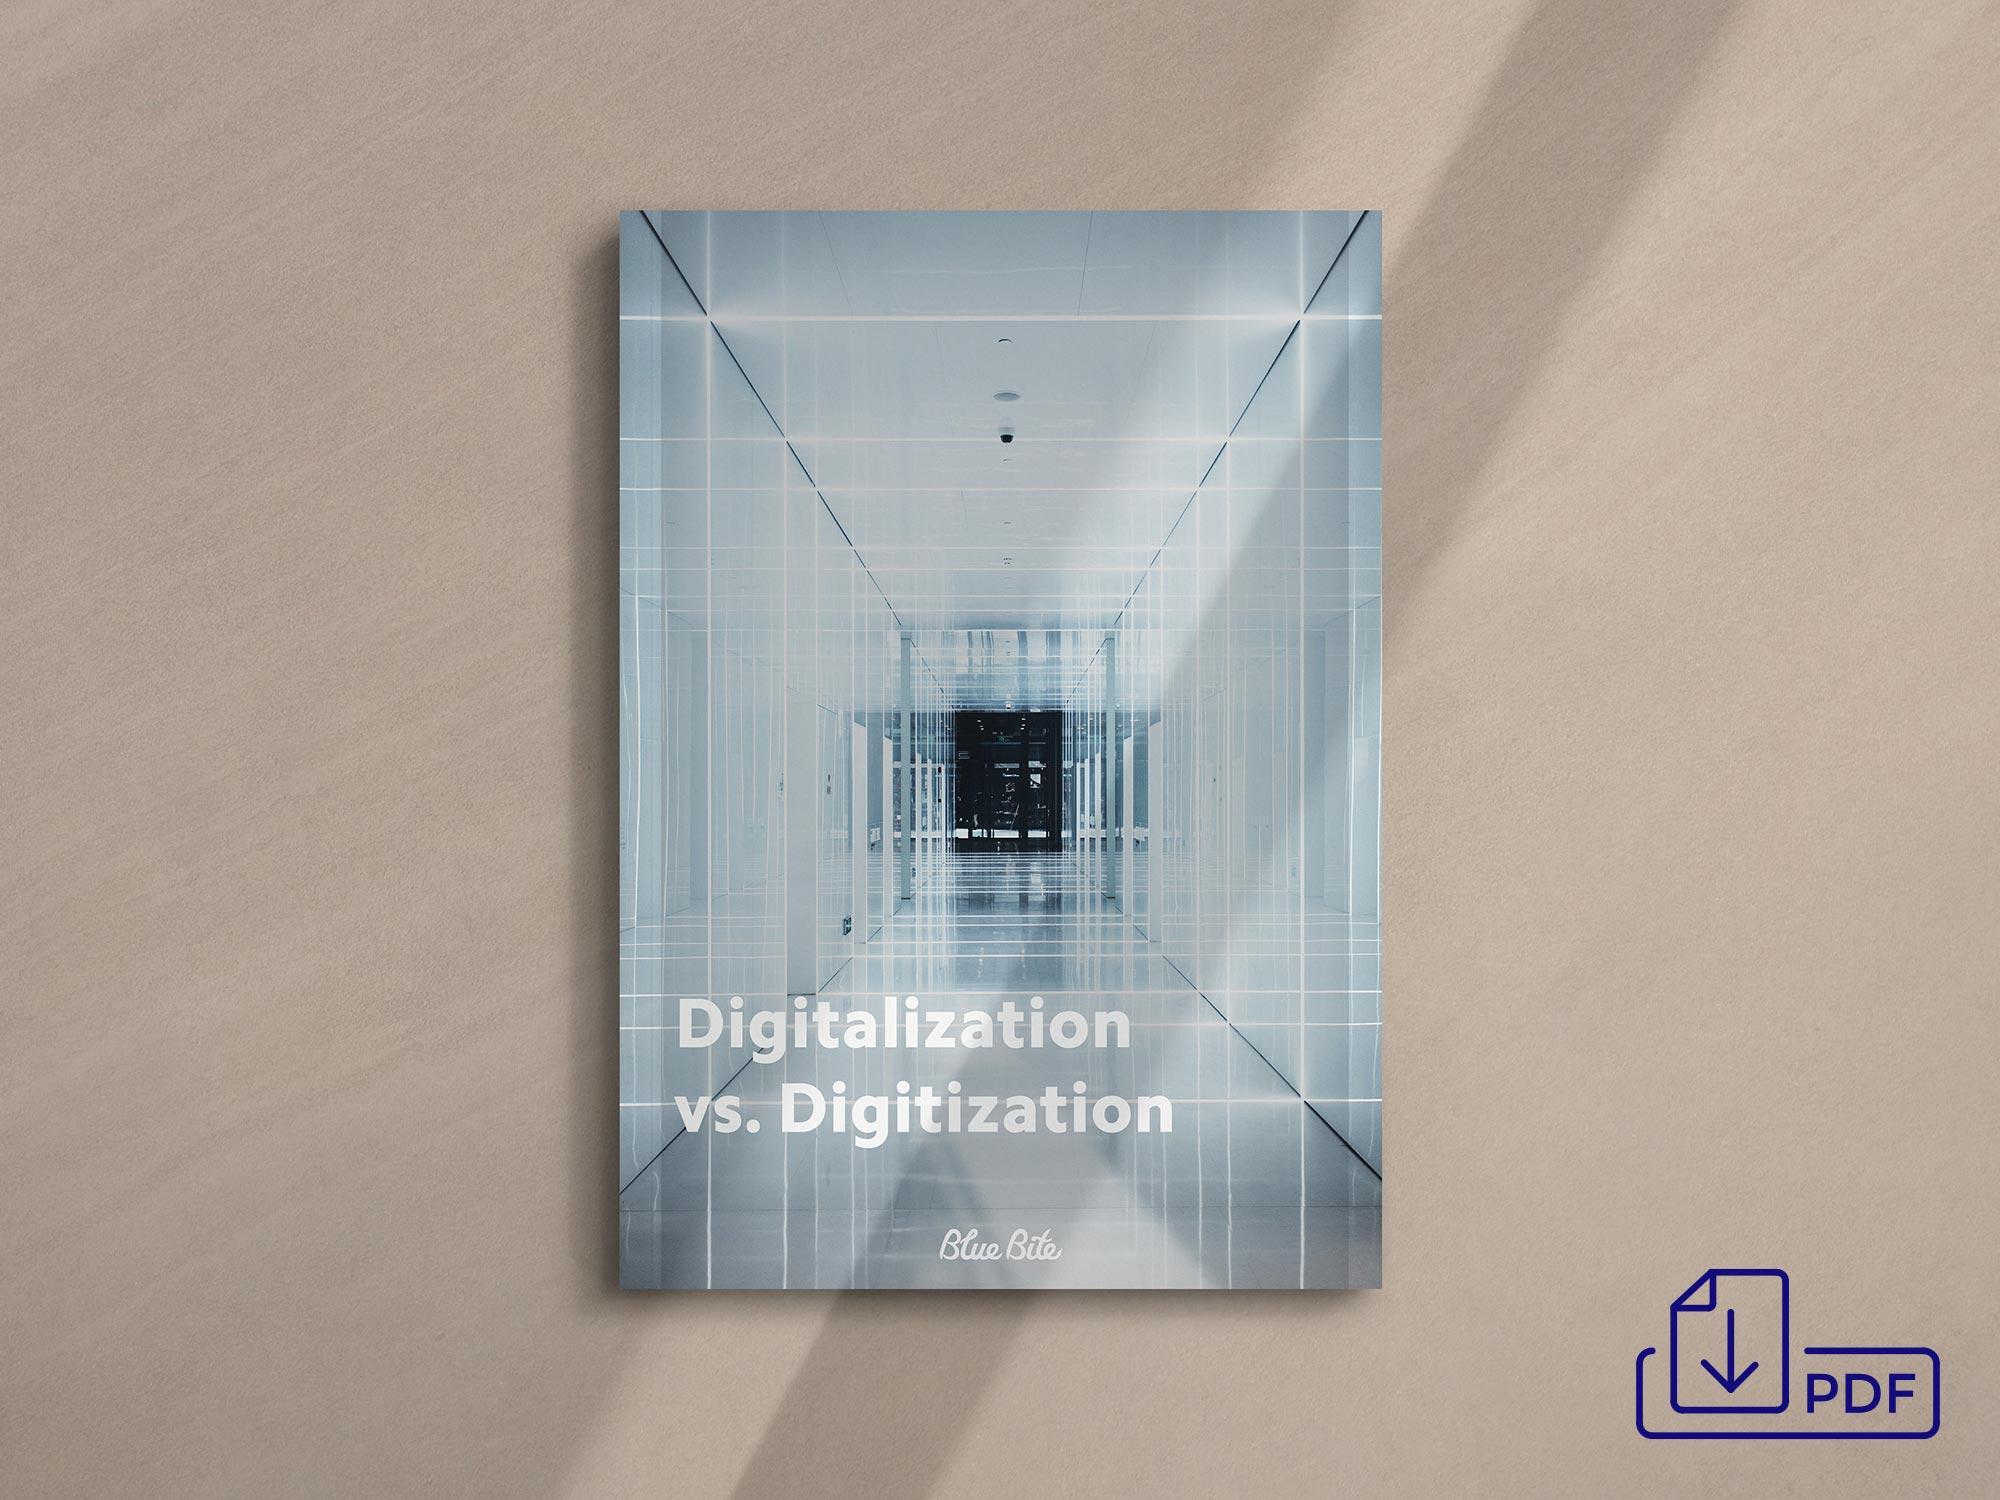 Get the Digitalization vs Digitization PDF